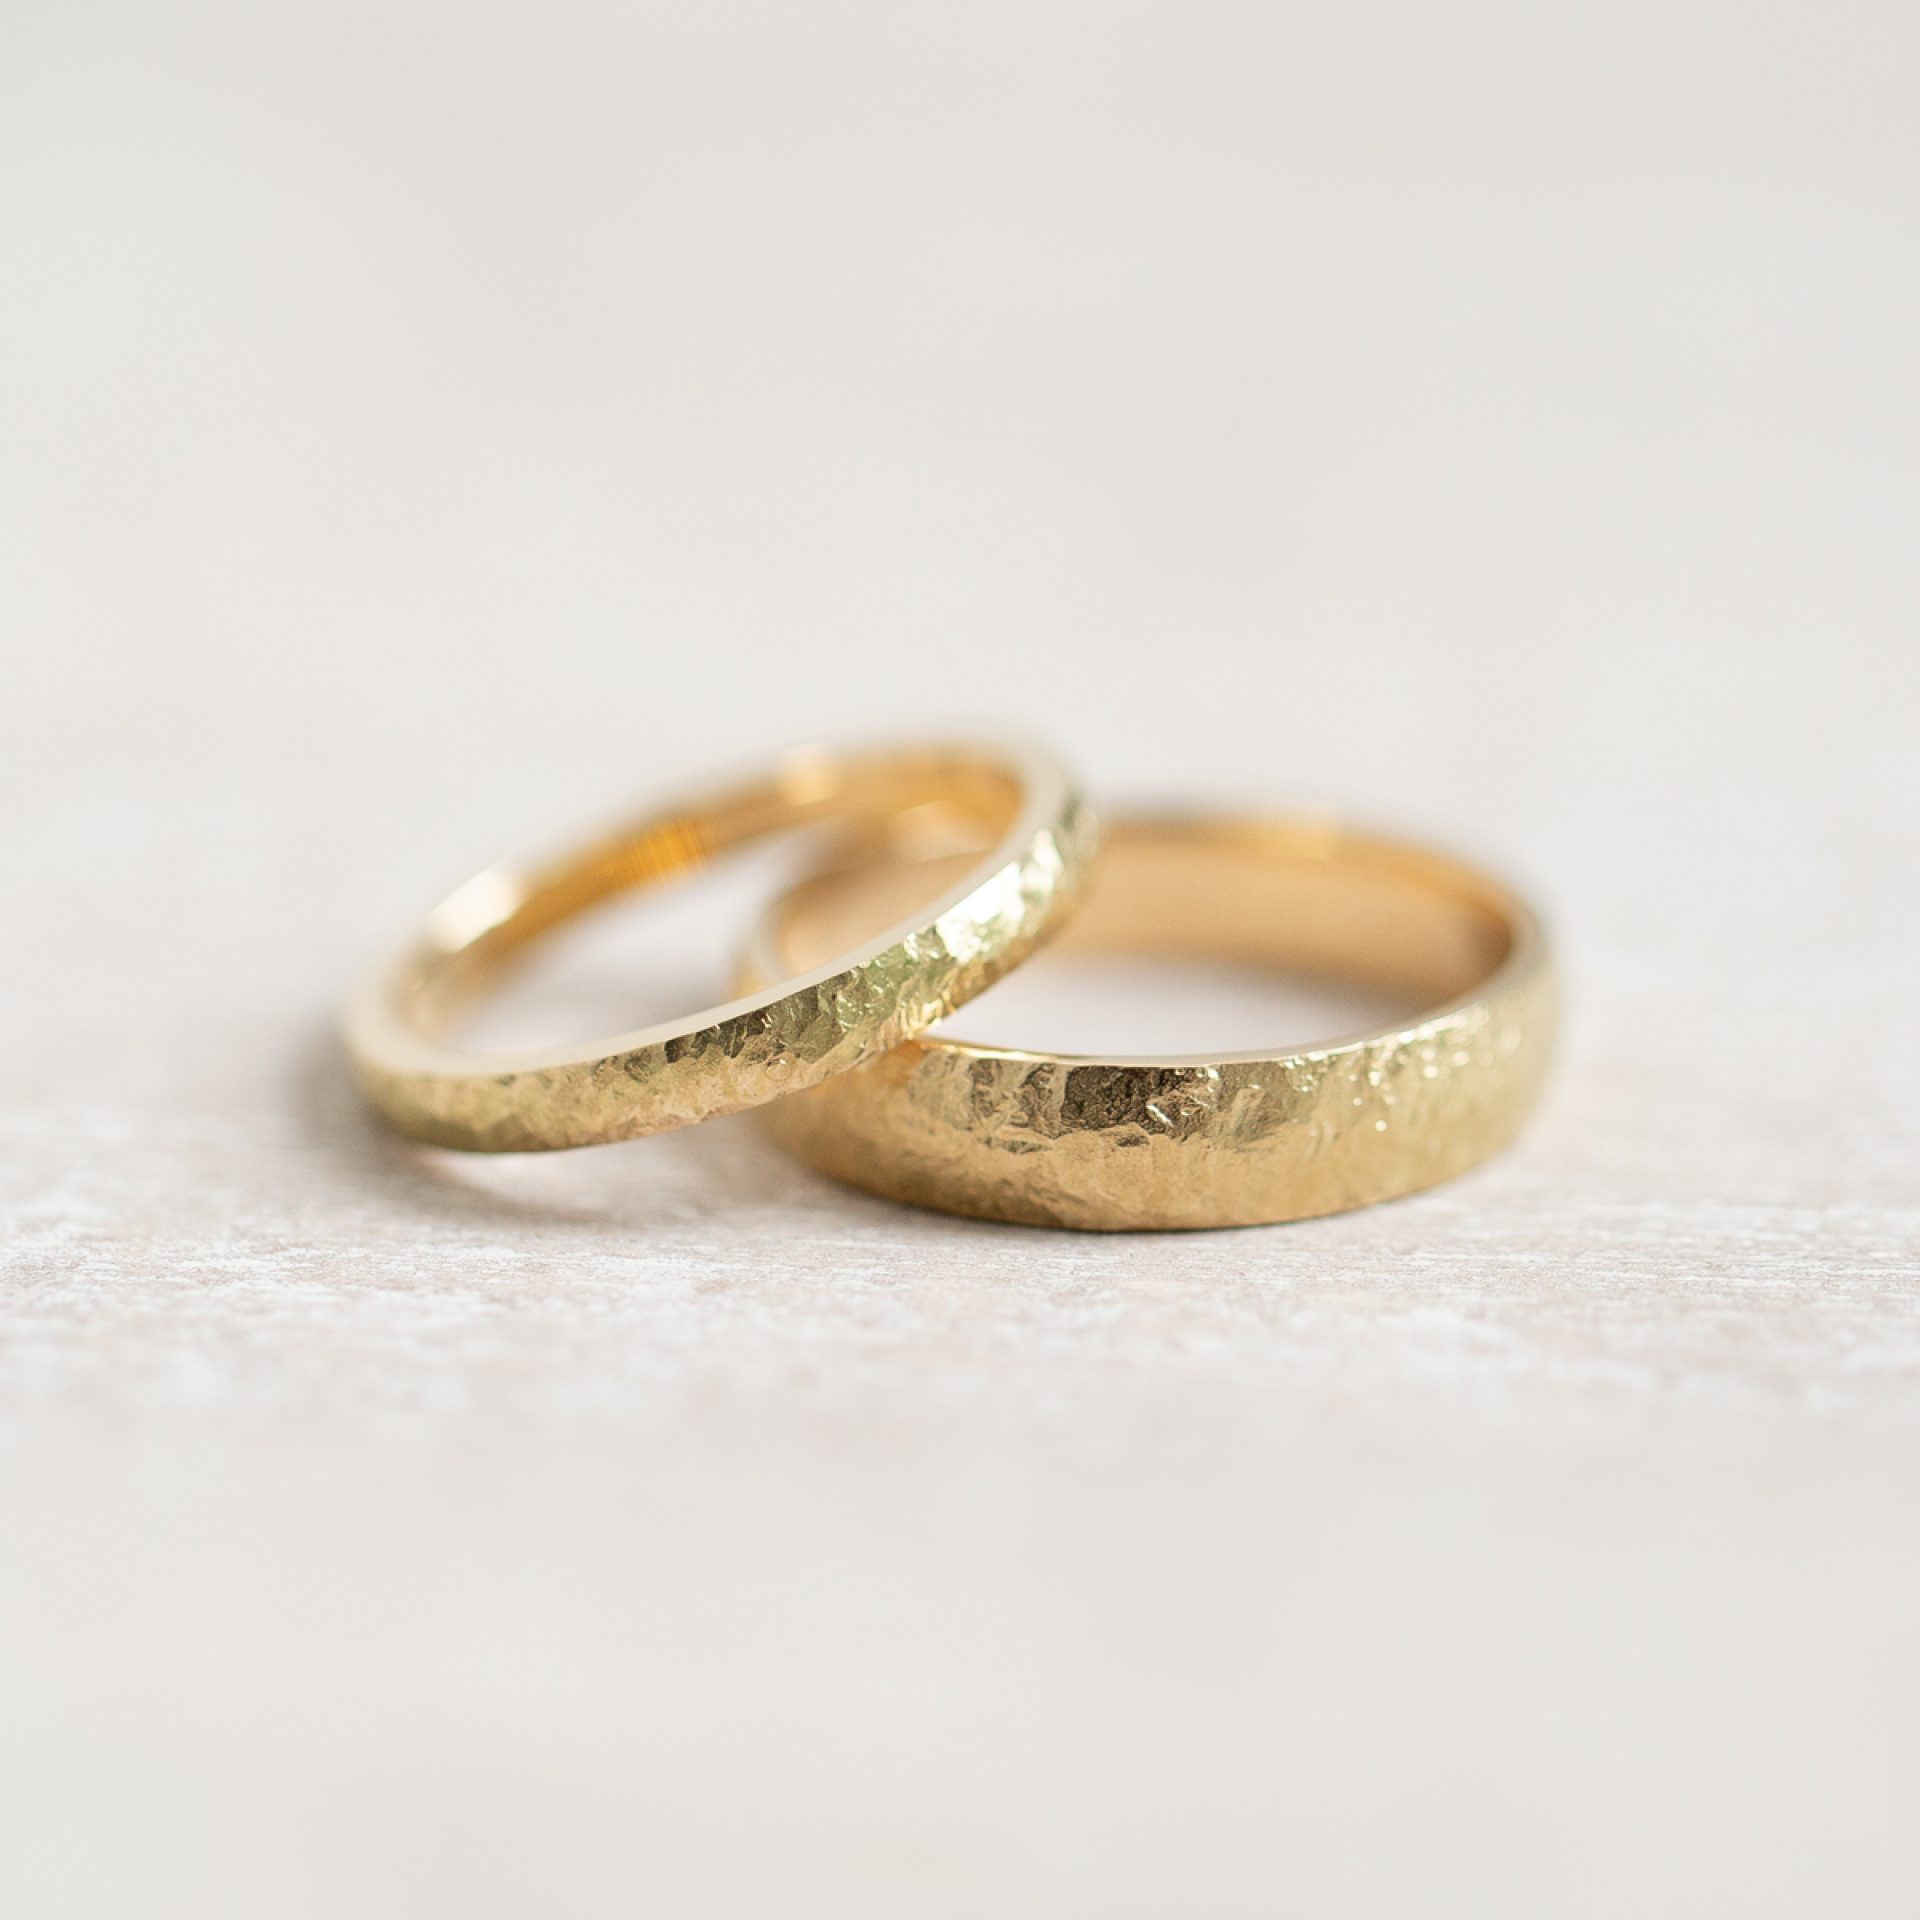 Set Eheringe Gehämmert Ehering Gold Set